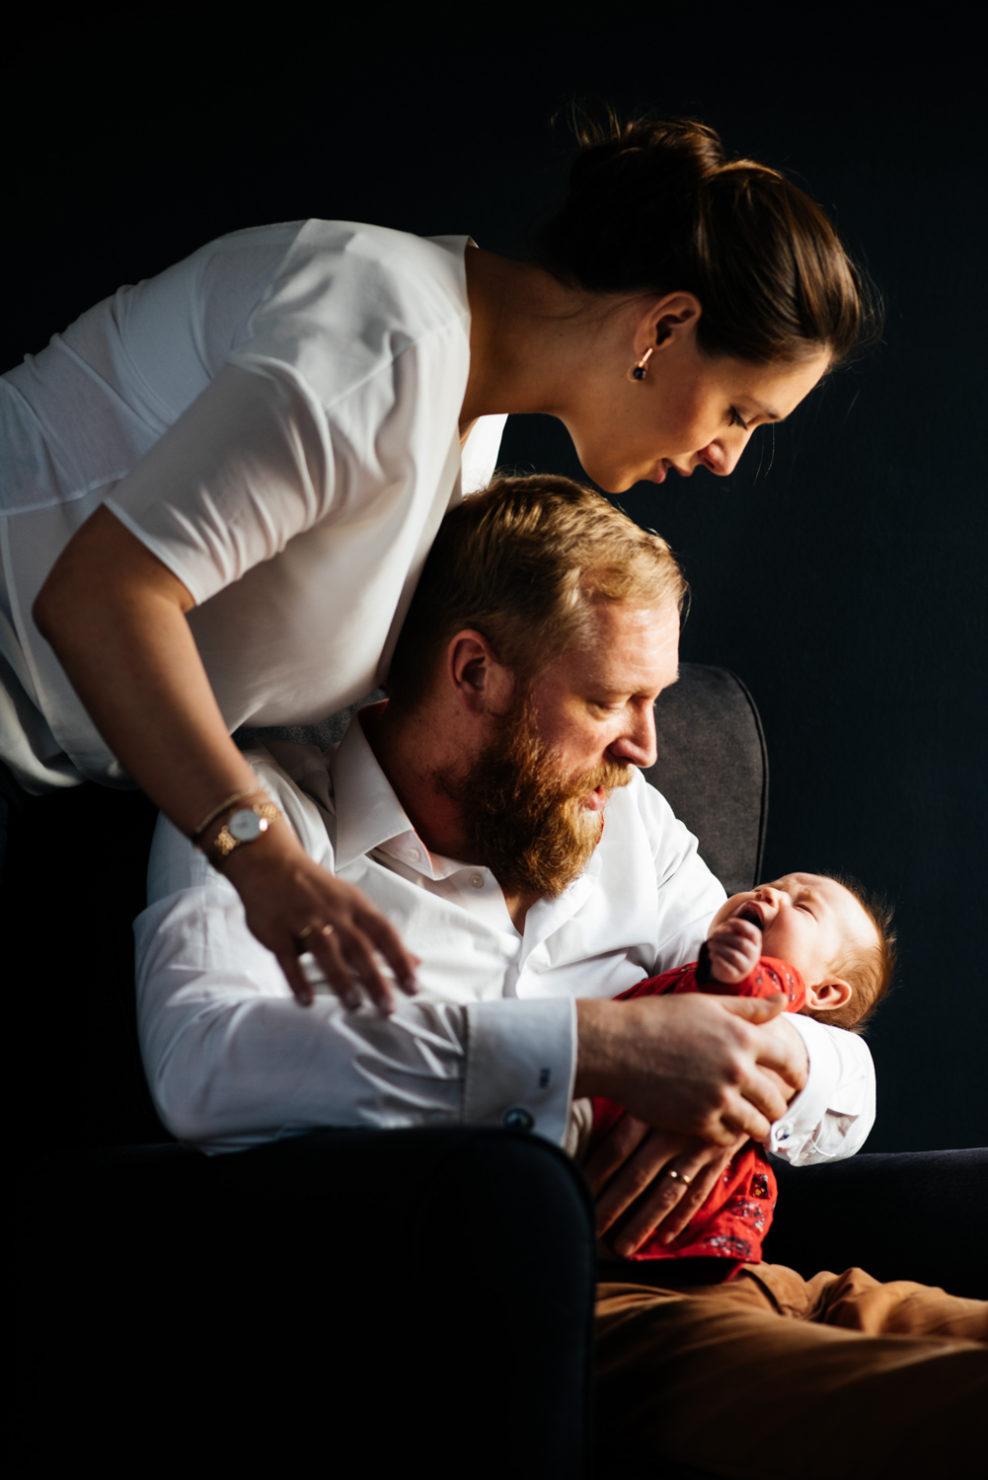 Natalia, Hendrik & Florence - Sesja rodzinna z noworodkiem w Komorowie - sesja rodzinna z noworodkiem